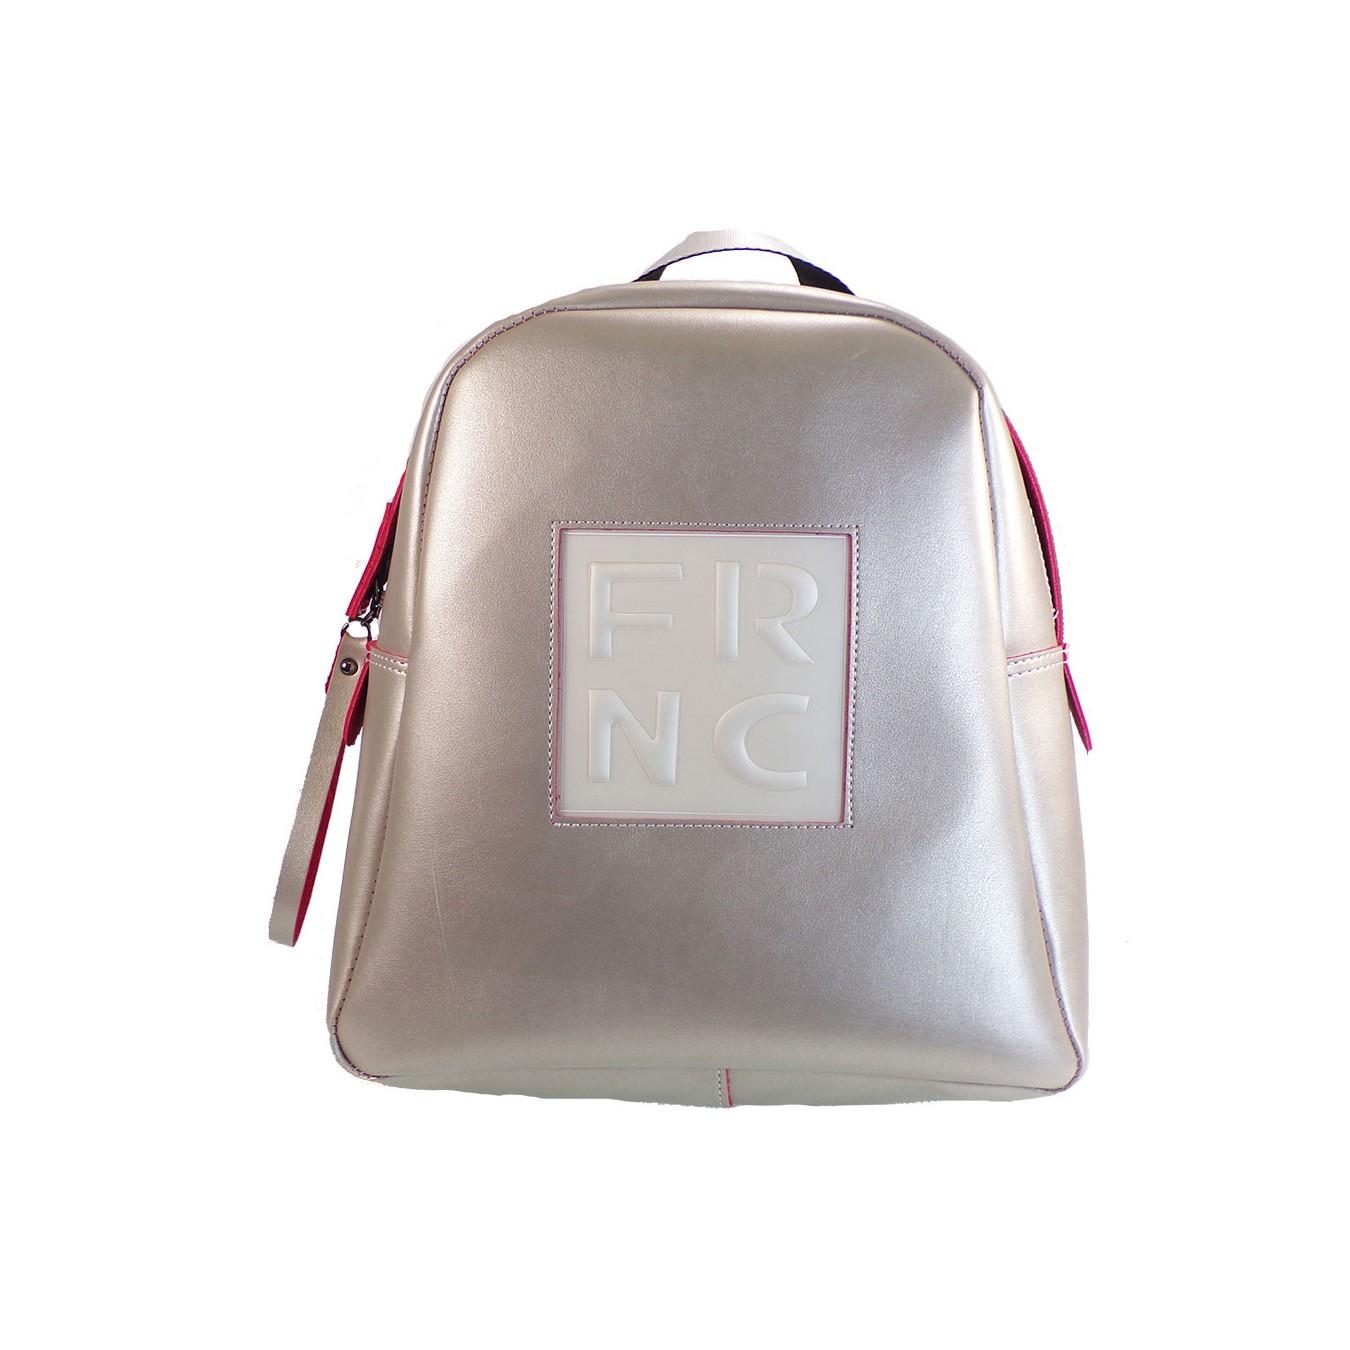 dc50445929 FRNC FRANCESCO Τσάντα Γυναικεία Πλάτης-Backpack 1201 Πλατίνα Δέρμα –  IShoeStore